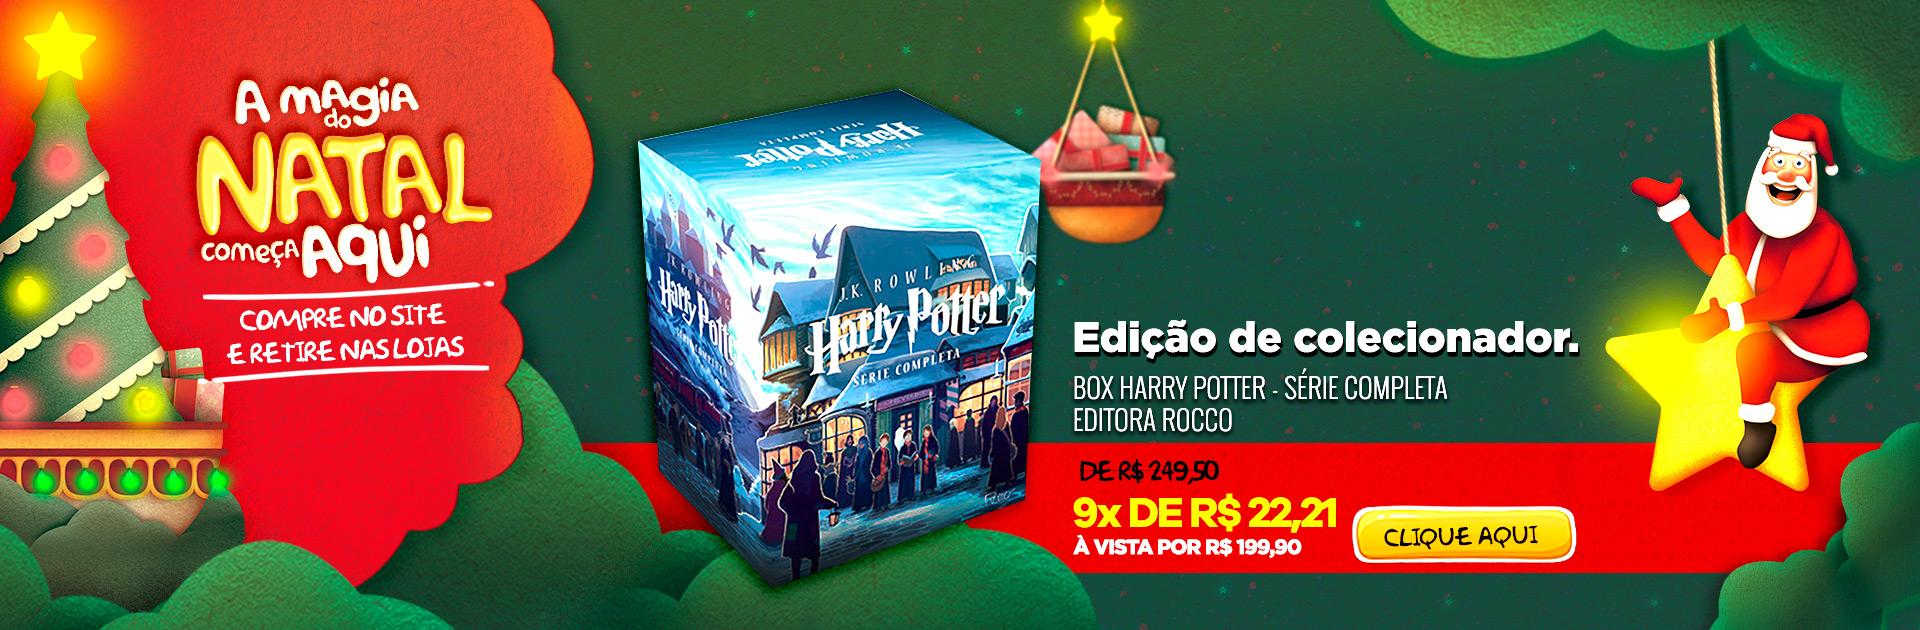 Natal - Box Harry Potter